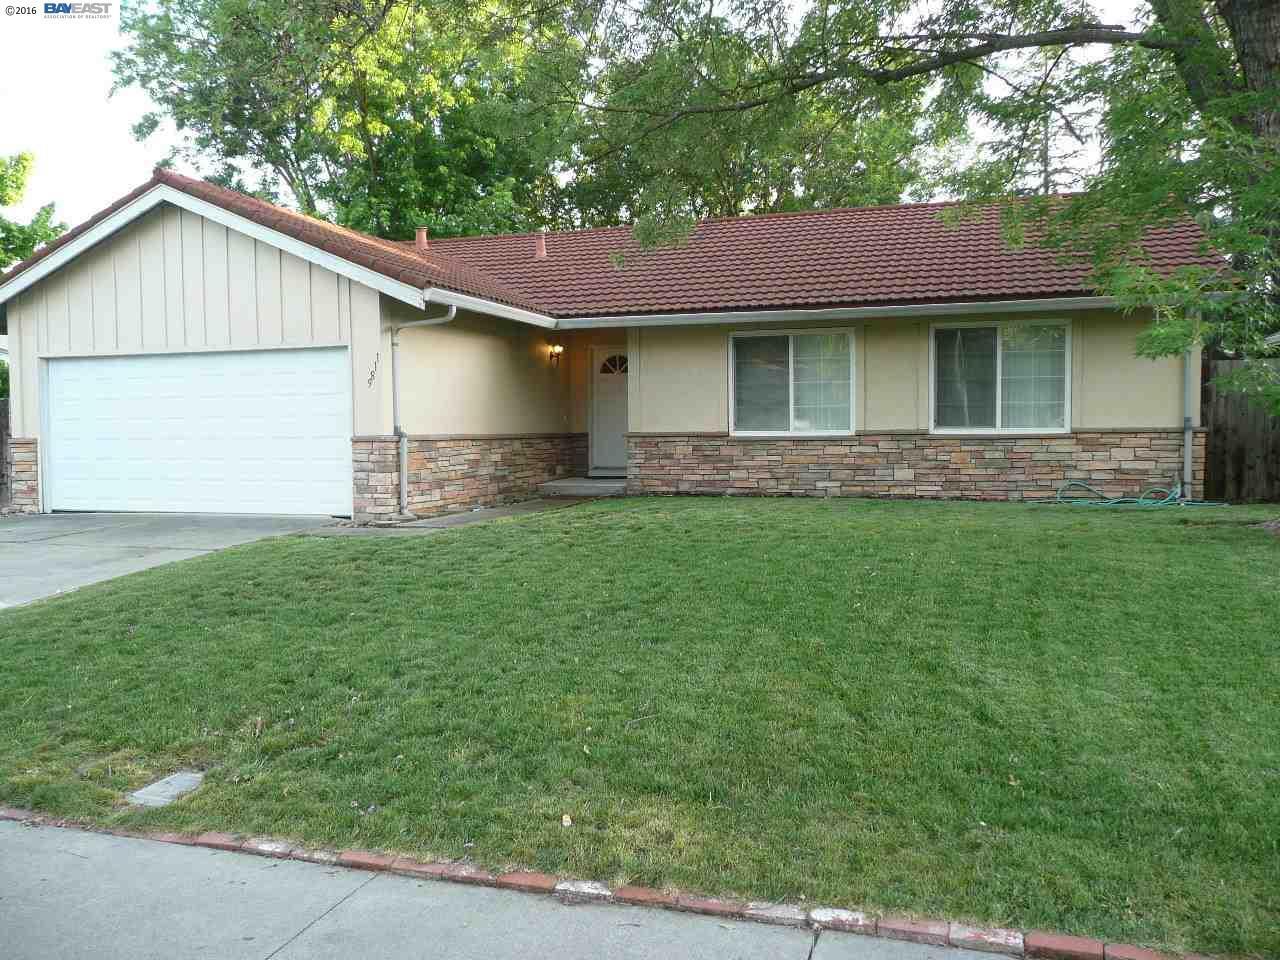 9811 Broadmoor Dr, SAN RAMON, CA 94583